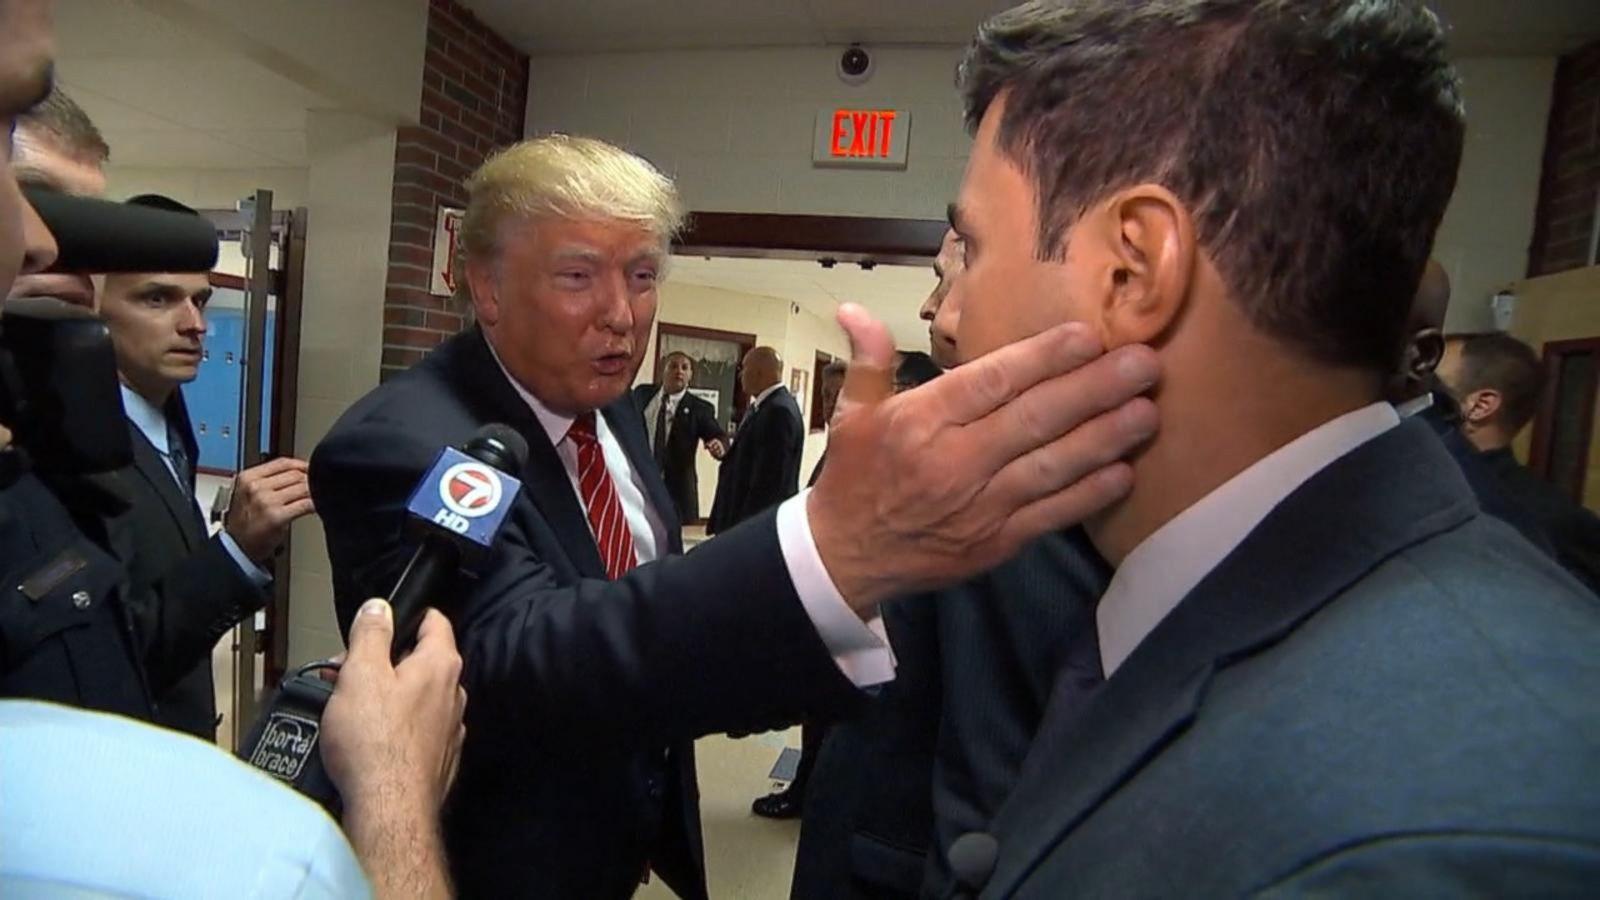 donald trump offers abc news tom llamas a love tap abc news